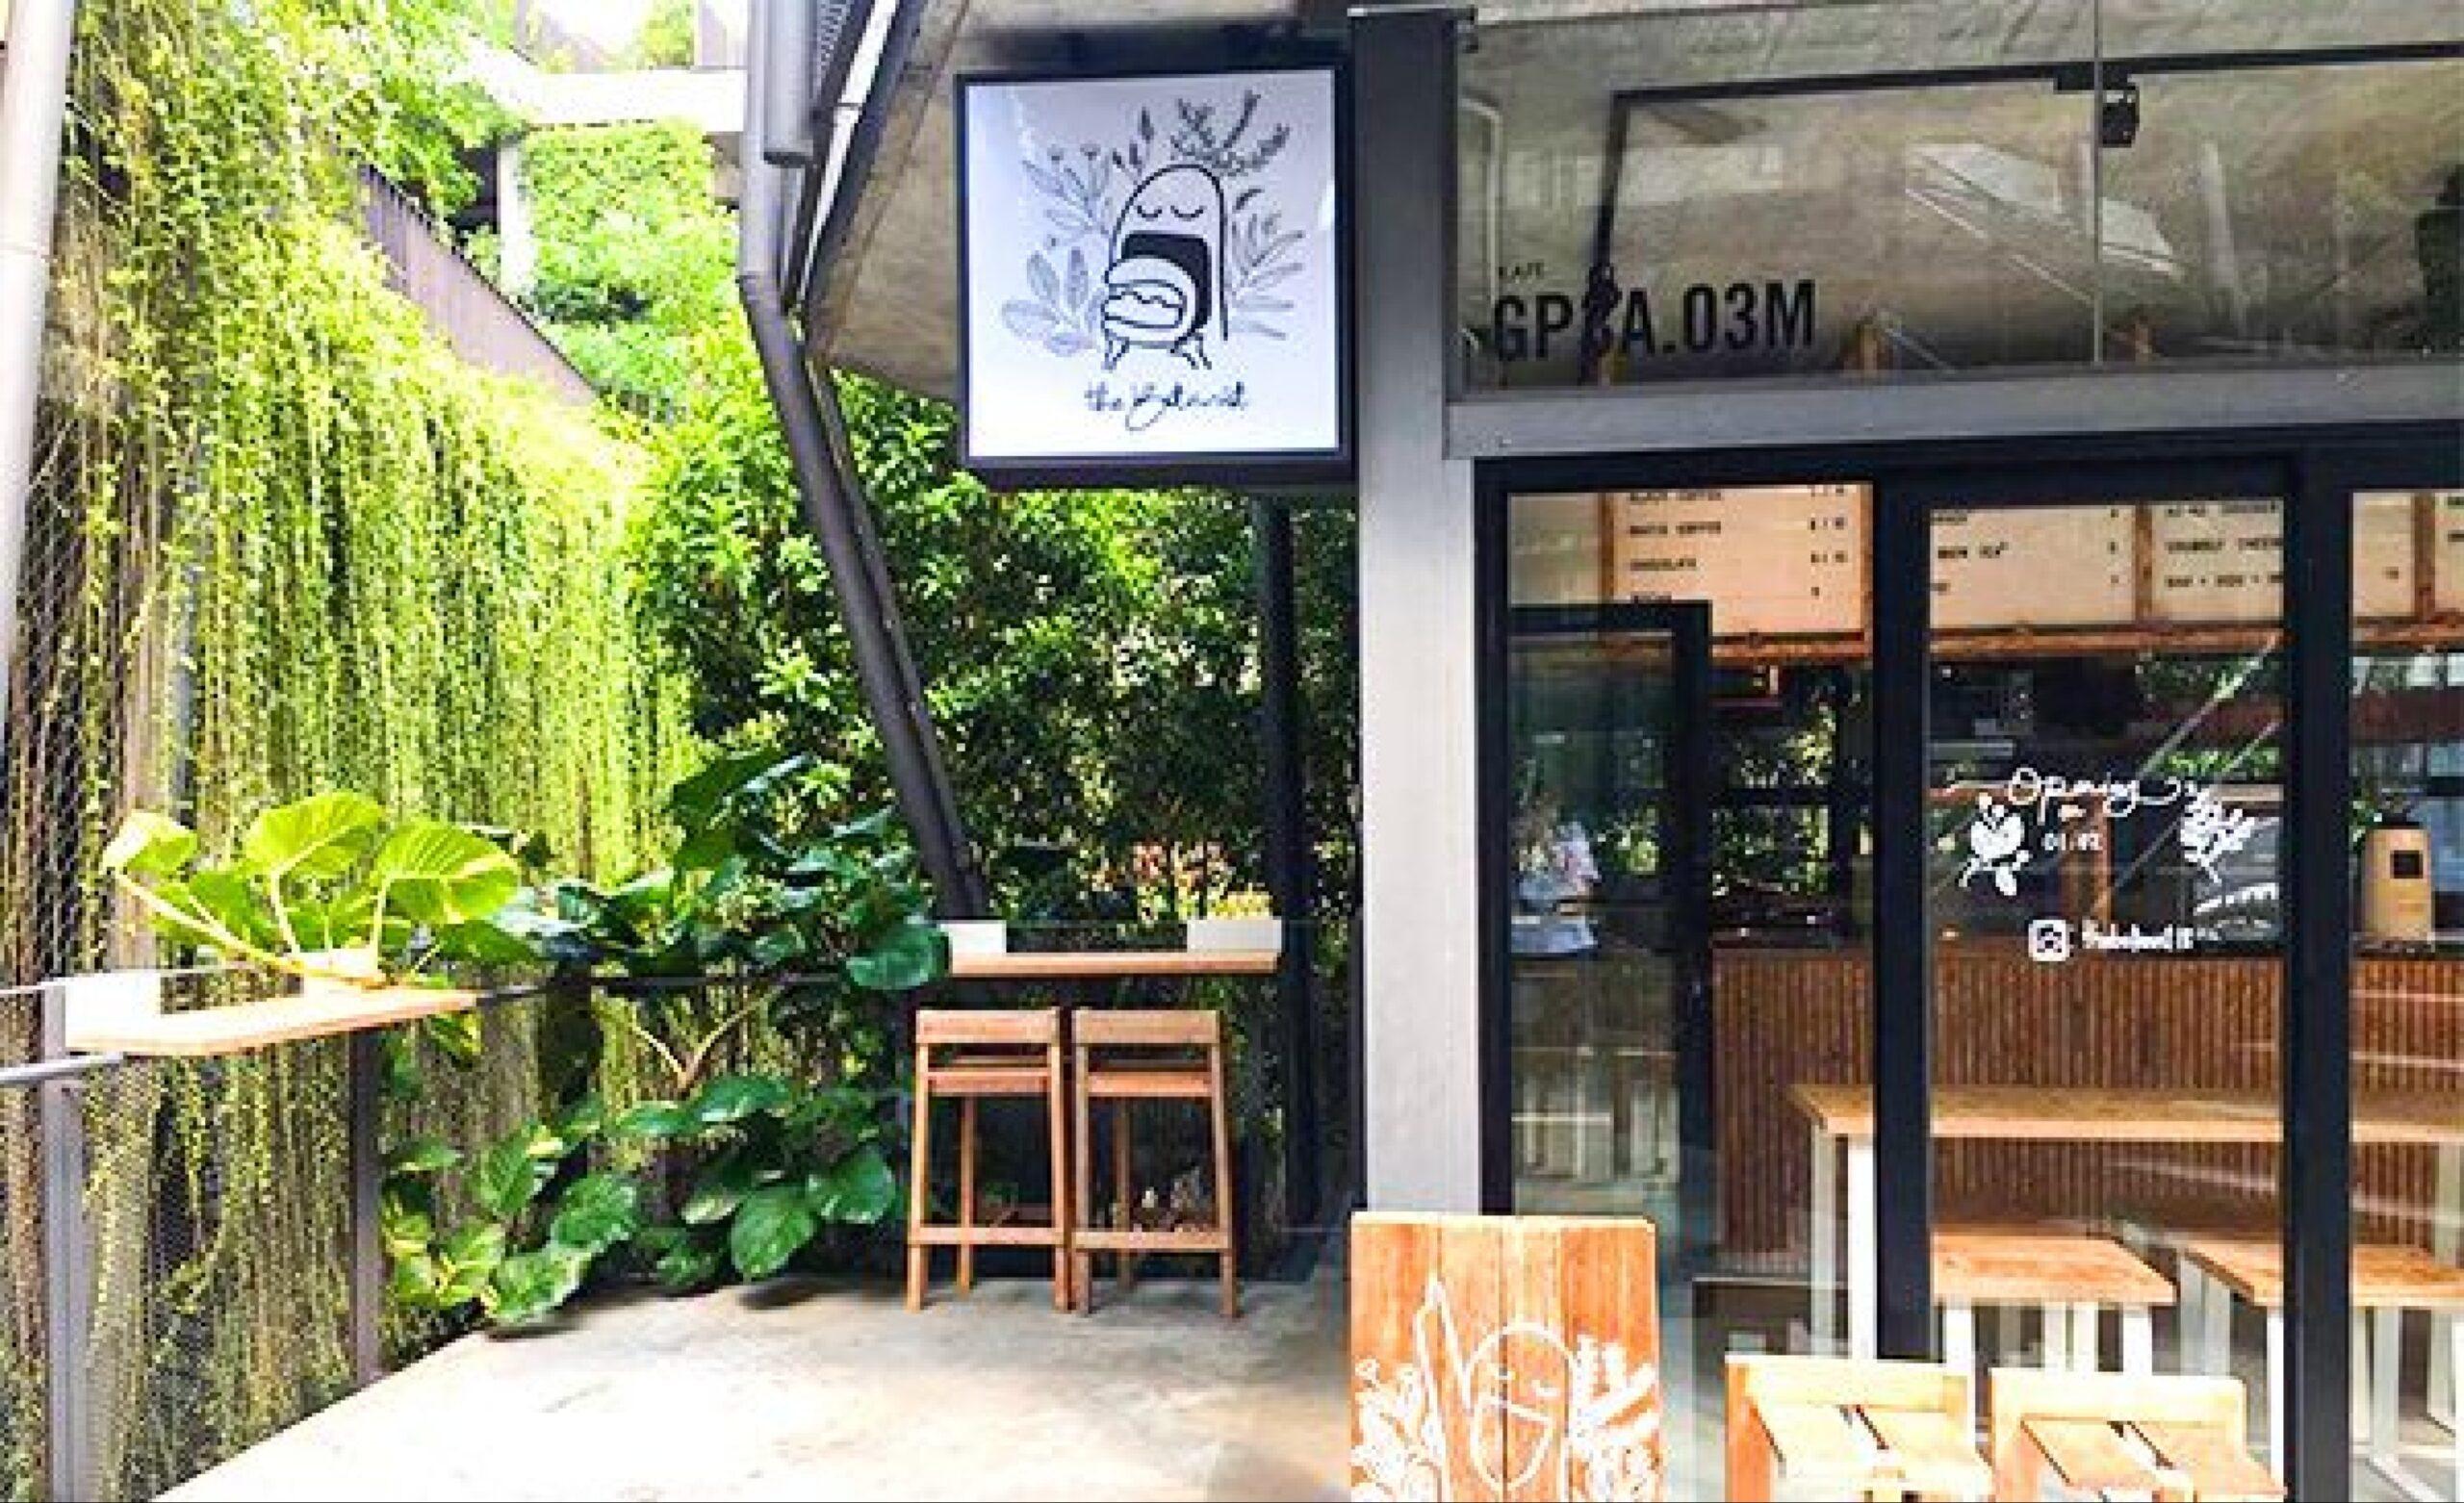 UNIQUE INSTAGRAMMABLE CAFES IN SELANGOR 6